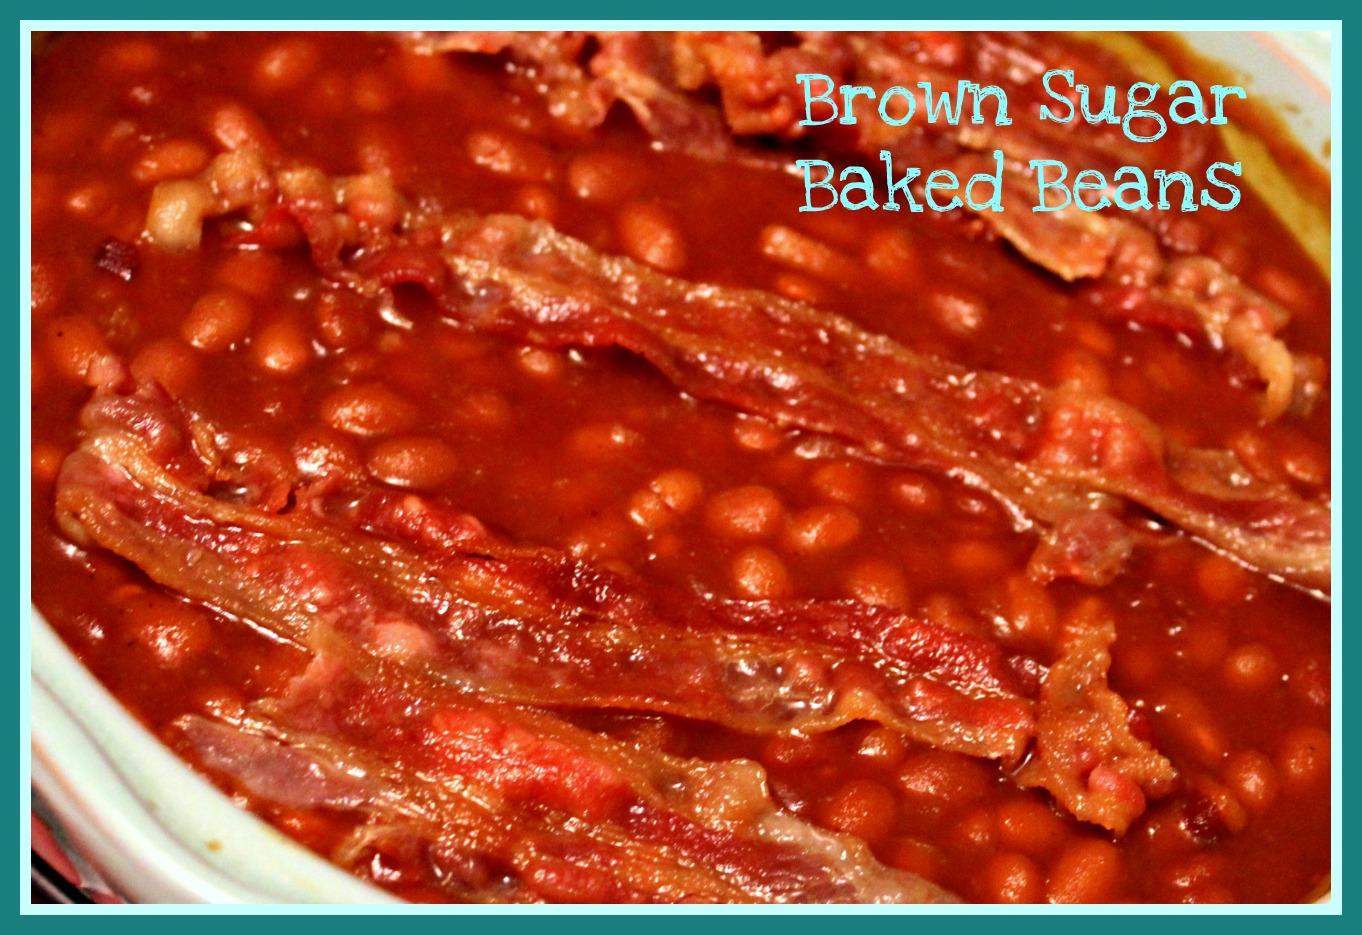 Brown Sugar Baked Beans!